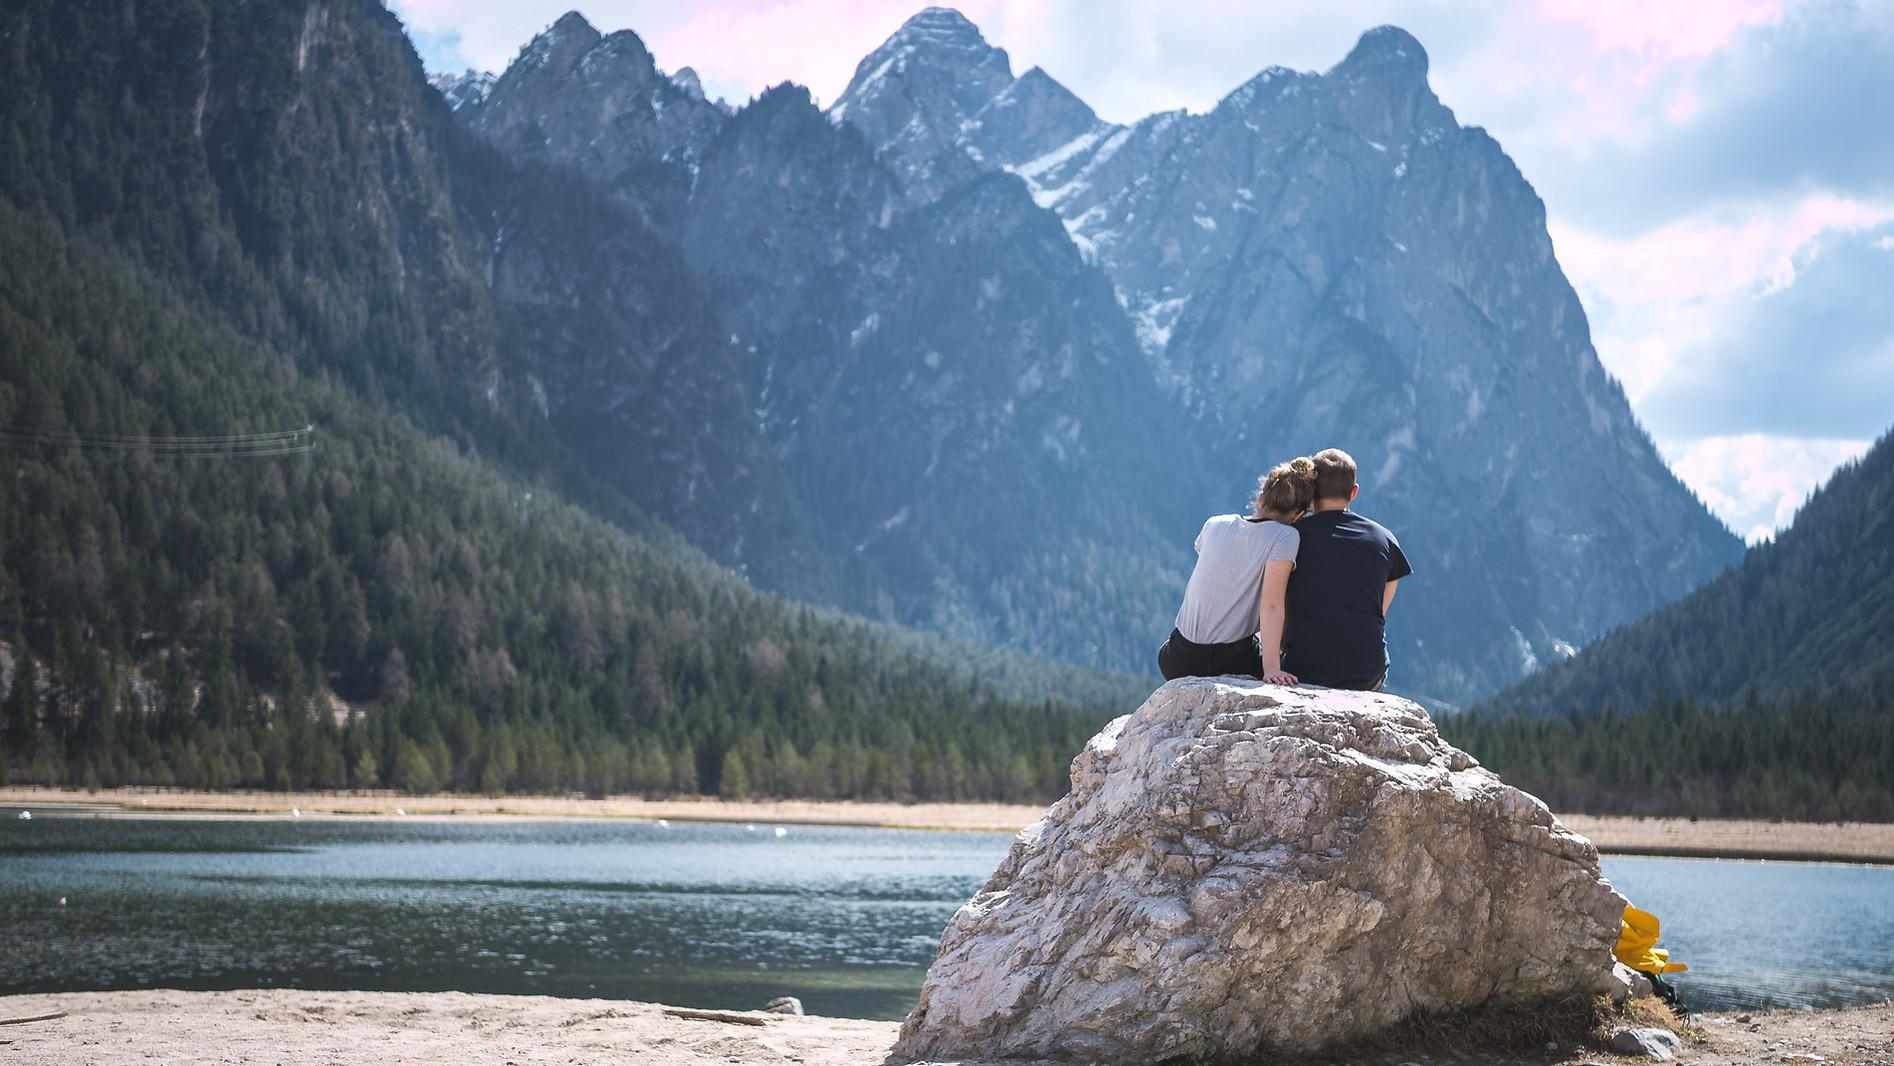 Romantic Couple Enjoying View